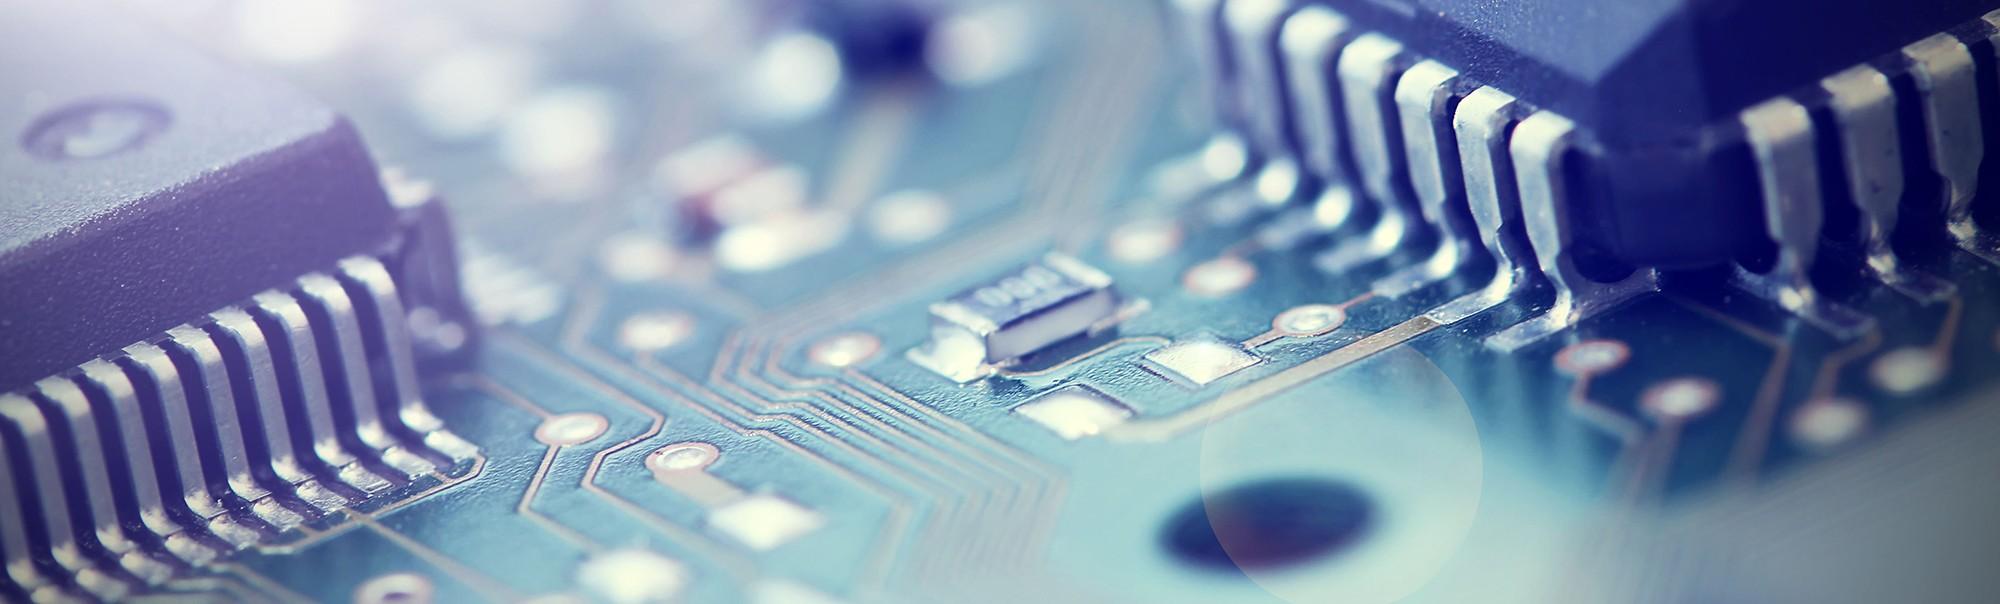 leddar sensing technology fundamentals